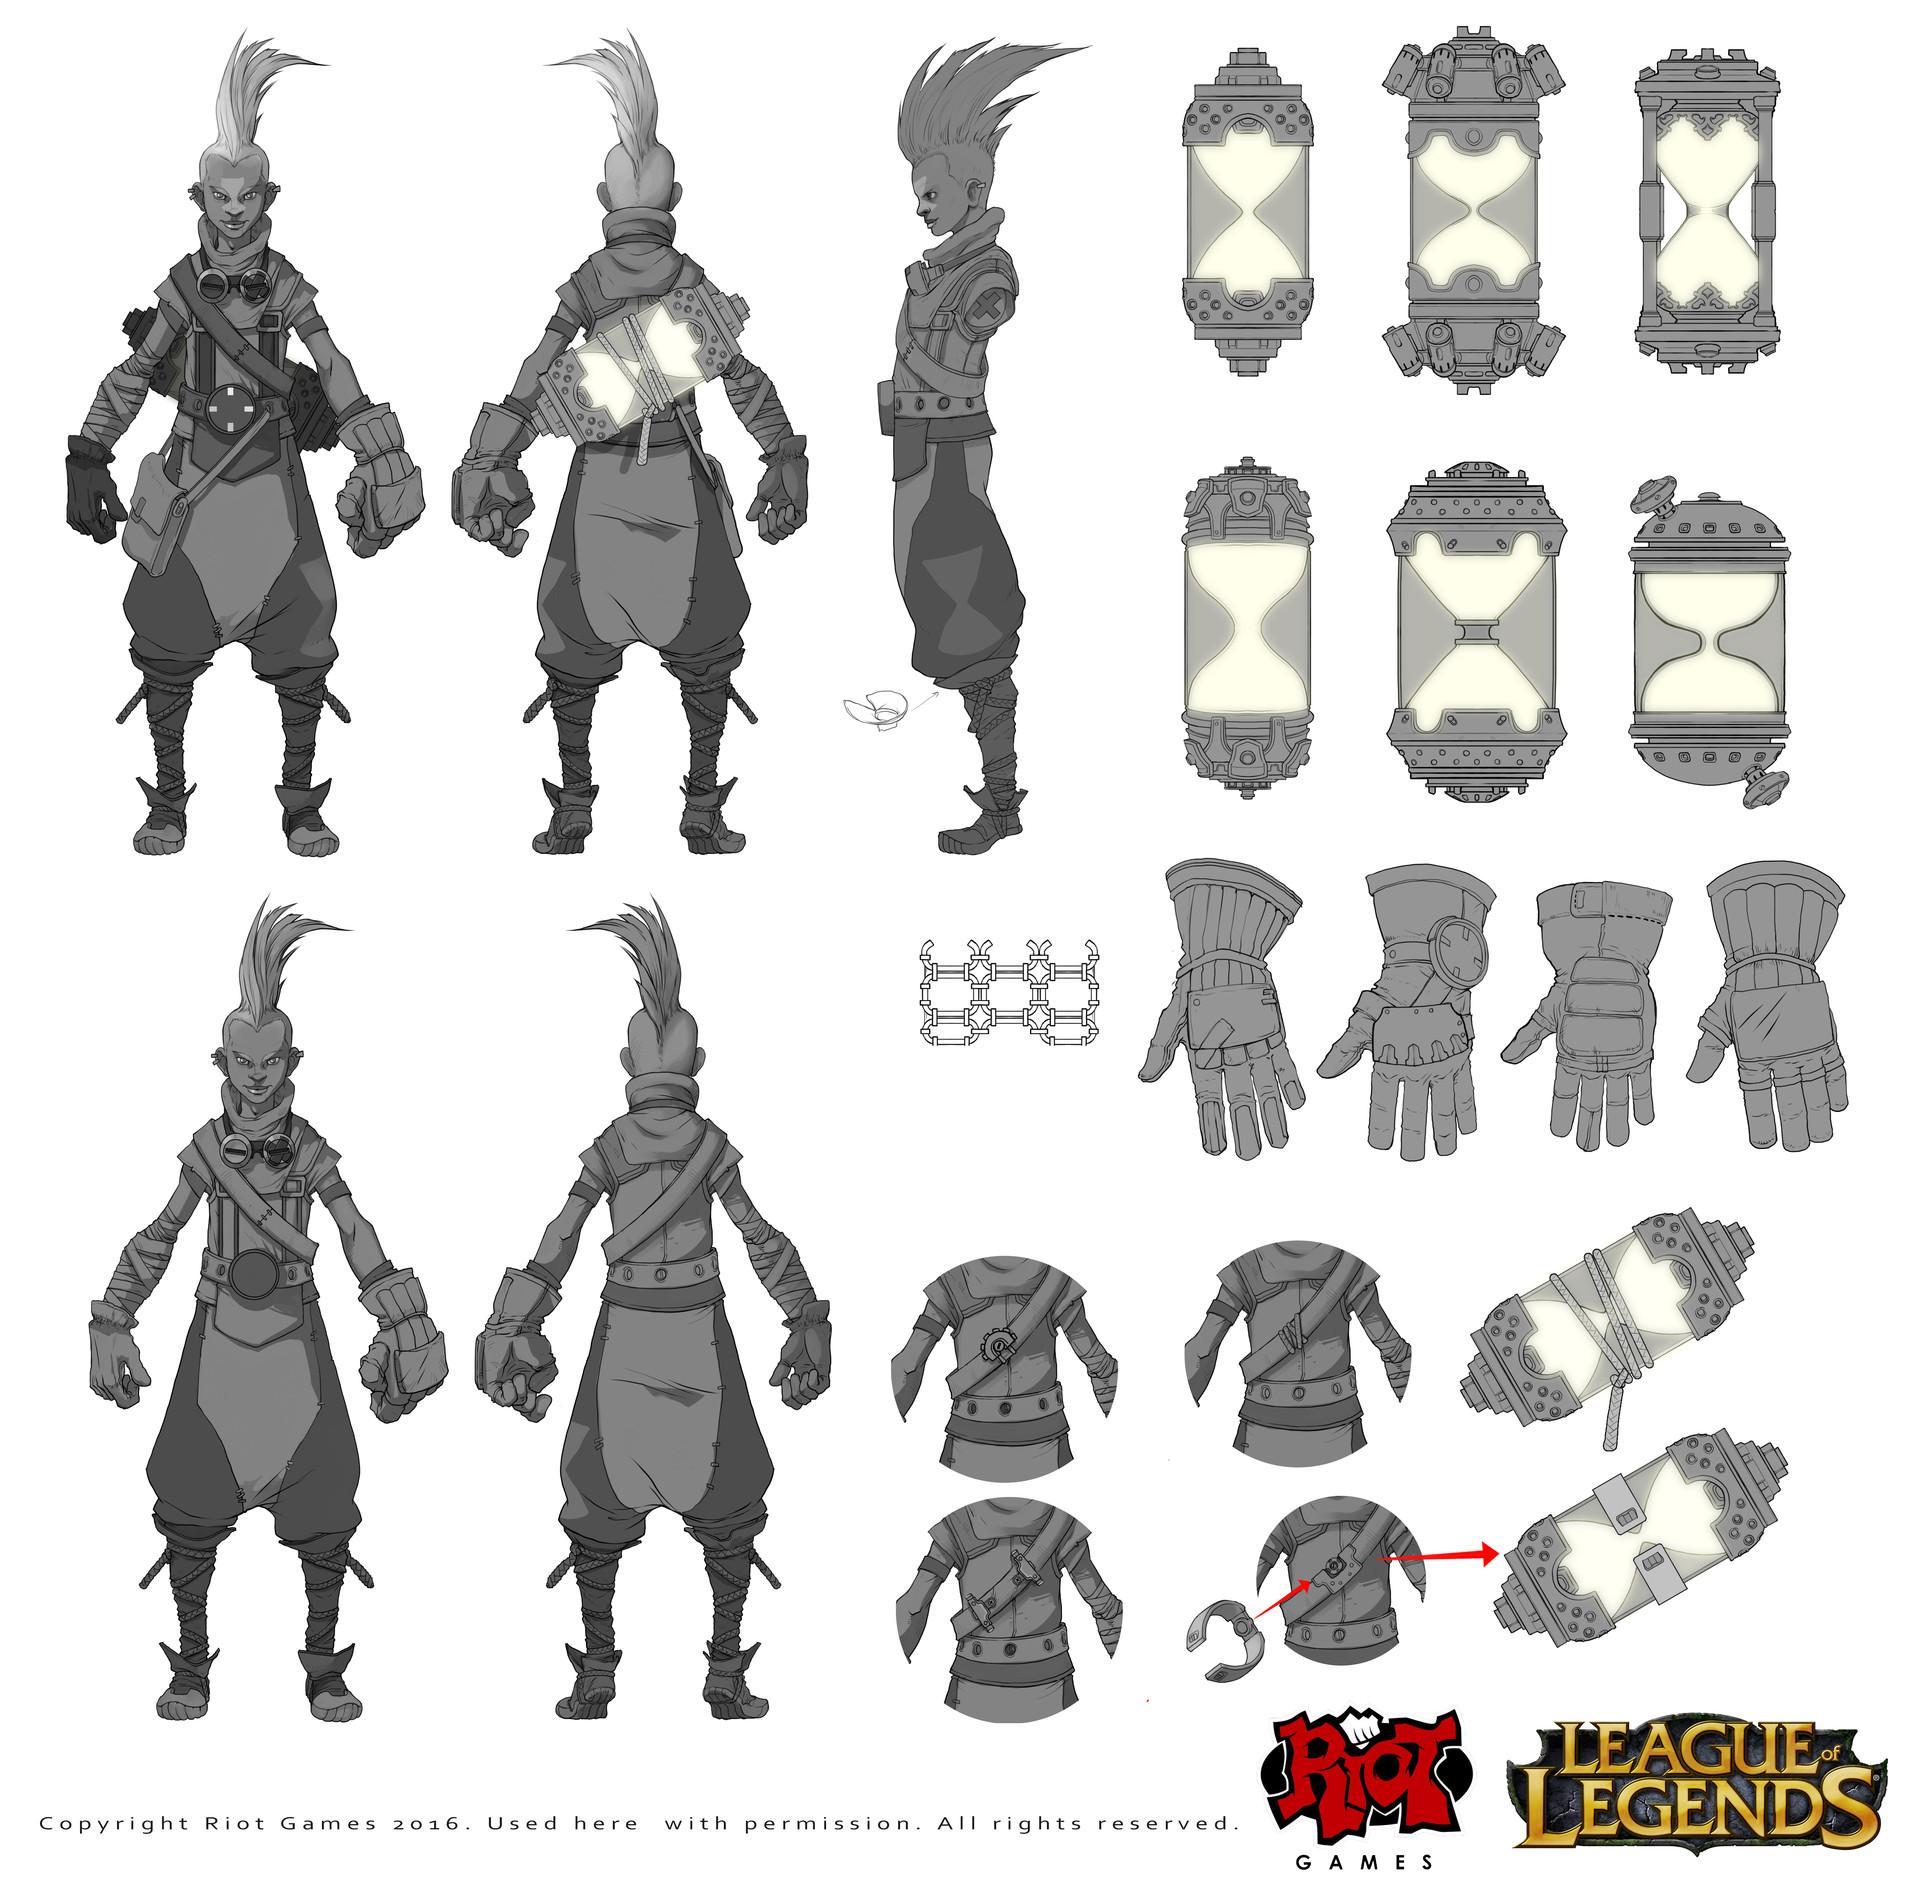 League Of Legends Character Design Contest : Riot creative contest character art ekko — polycount